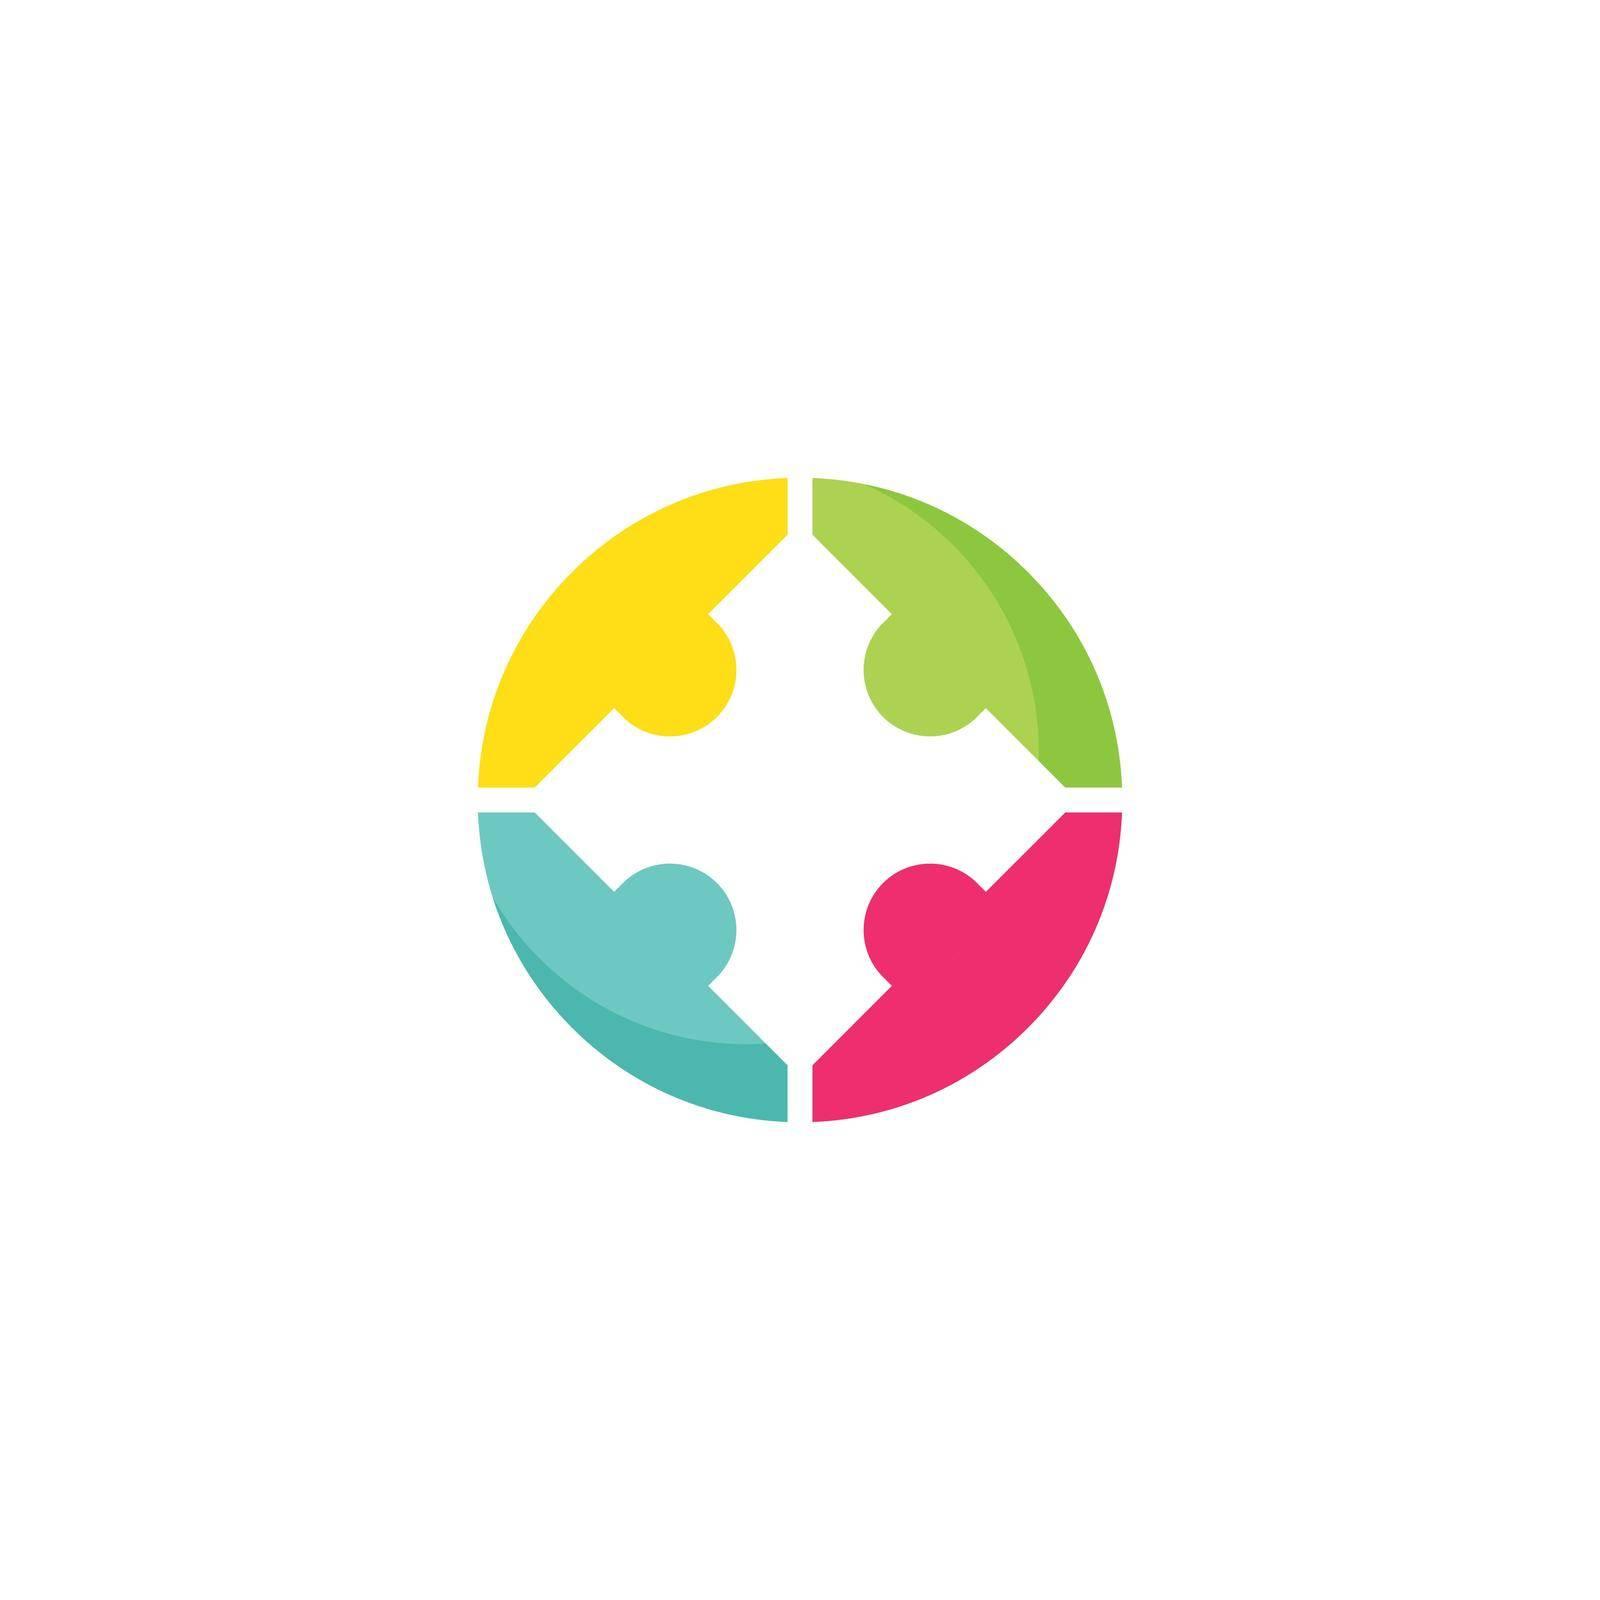 Community, network and social logo design